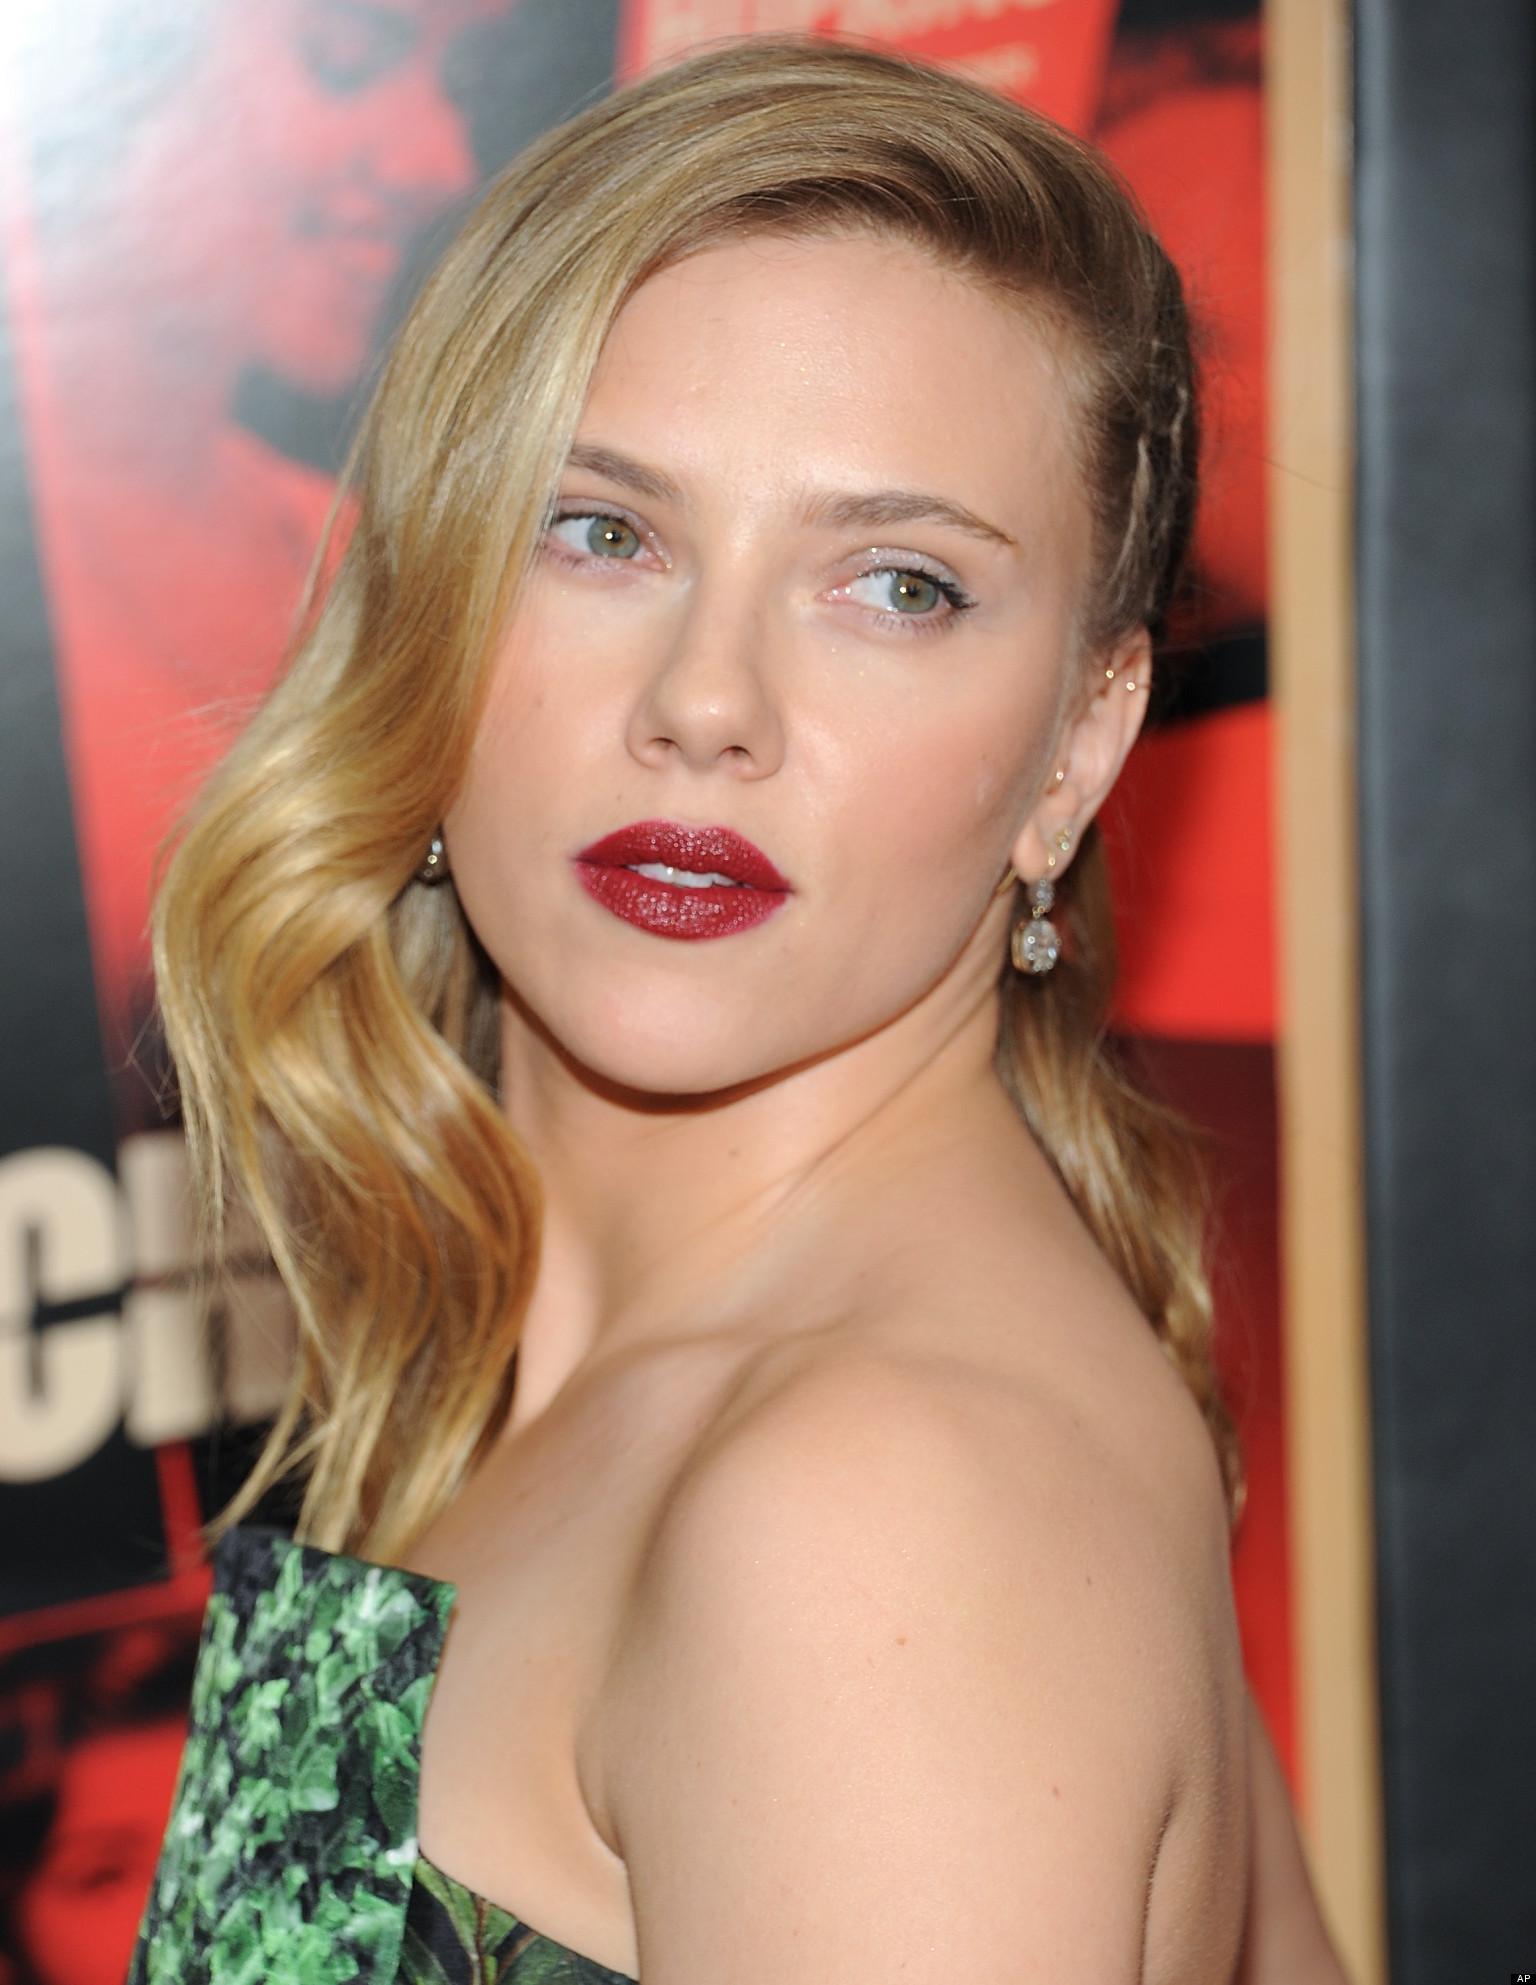 Scarlett Johansson Nude Pictures Hacker Jailed For 10